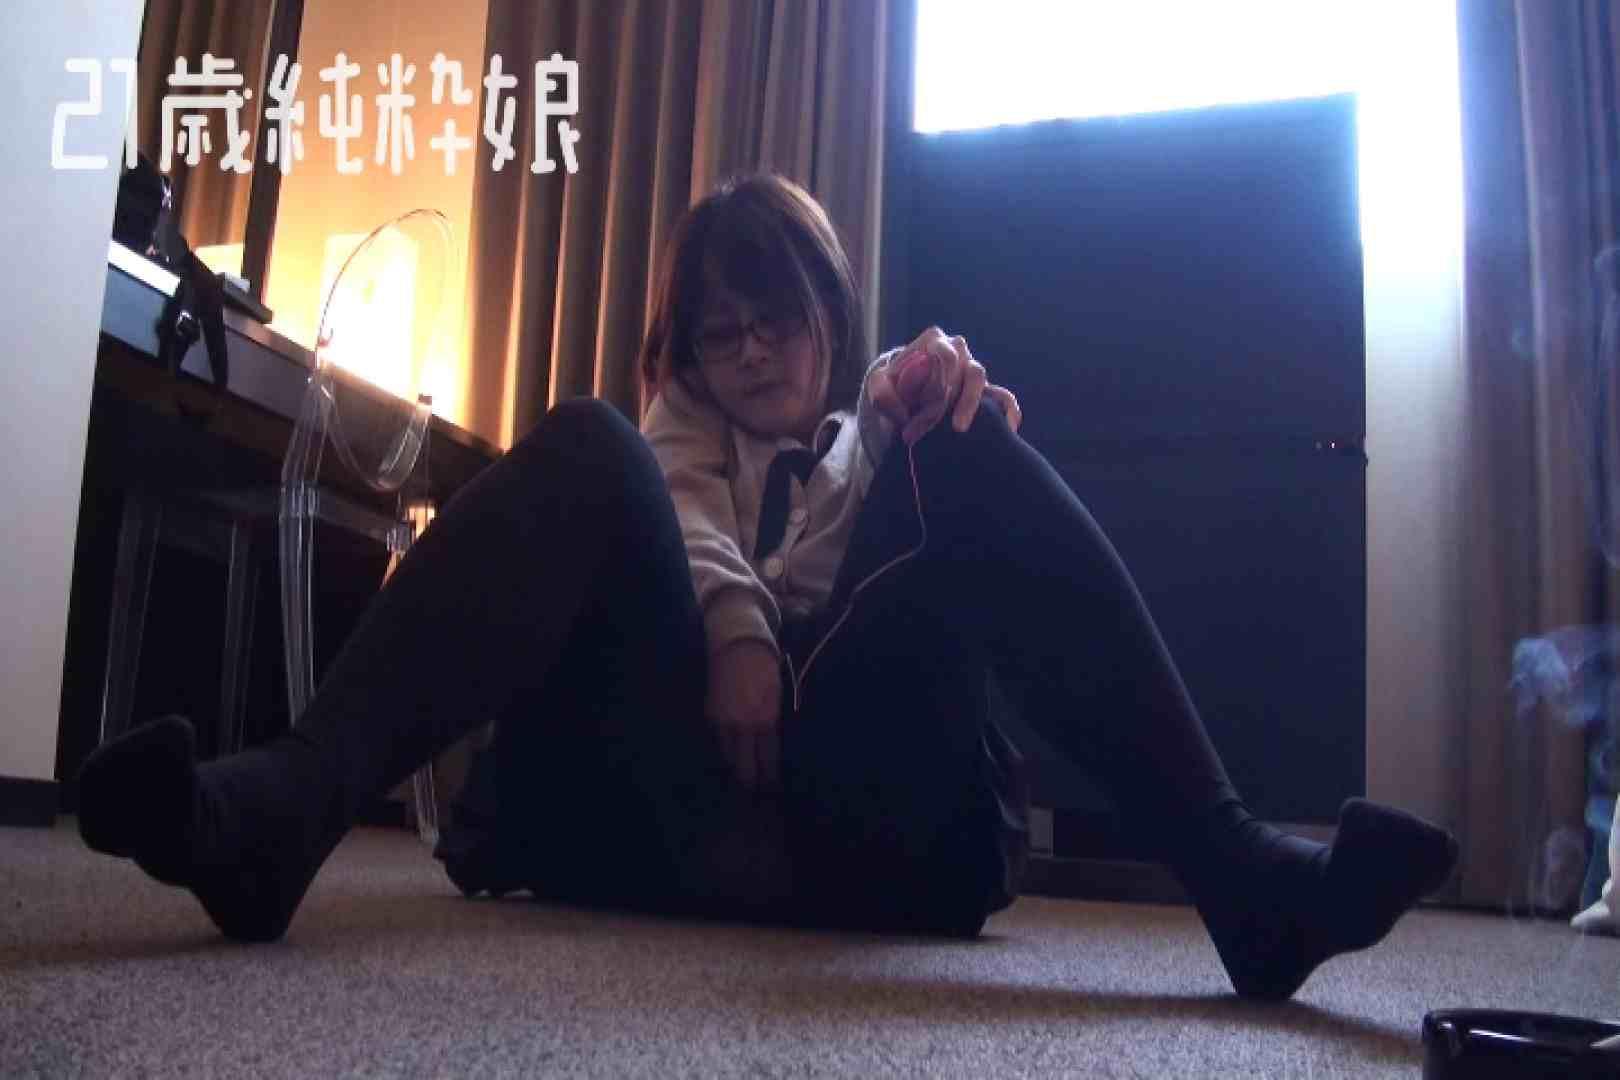 Gカップ21歳純粋嬢第2弾Vol.3 美女OL | 学校内で  95連発 13